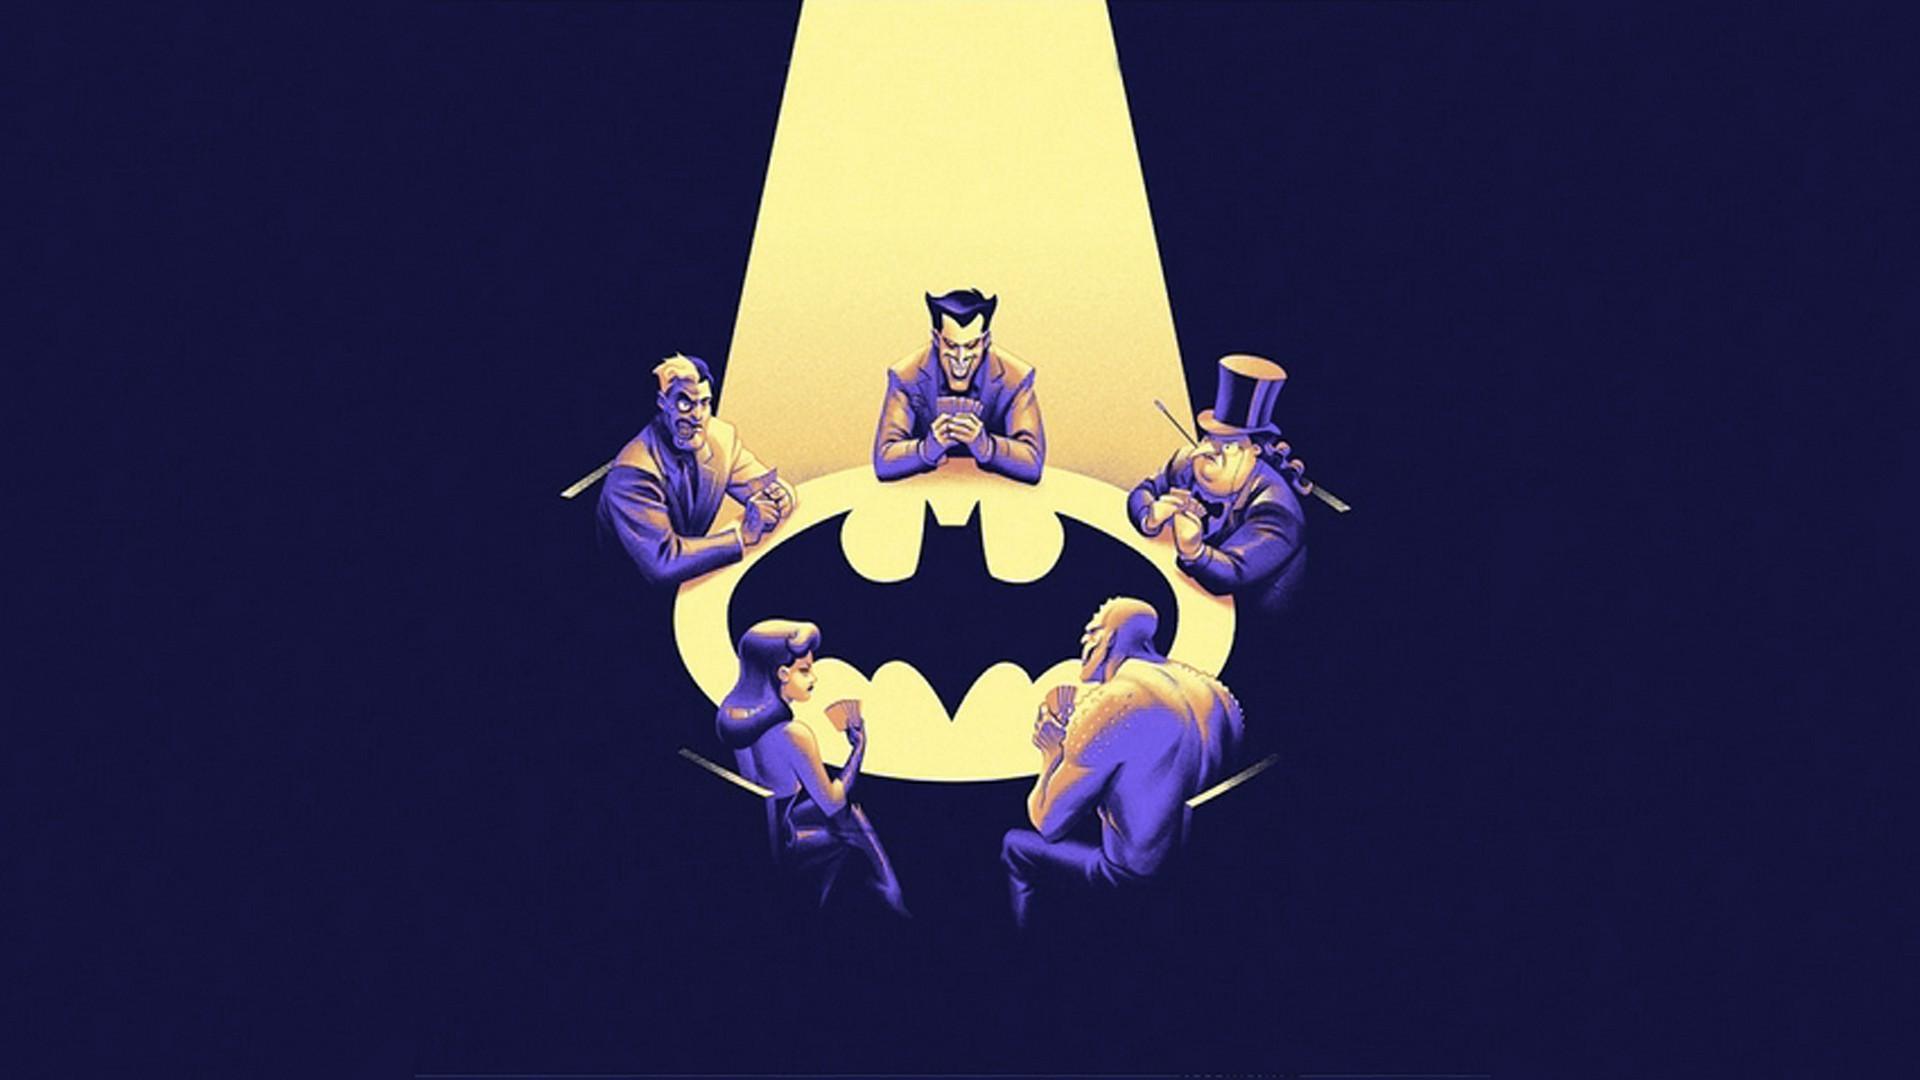 Batman animated wallpapers (39 Wallpapers)